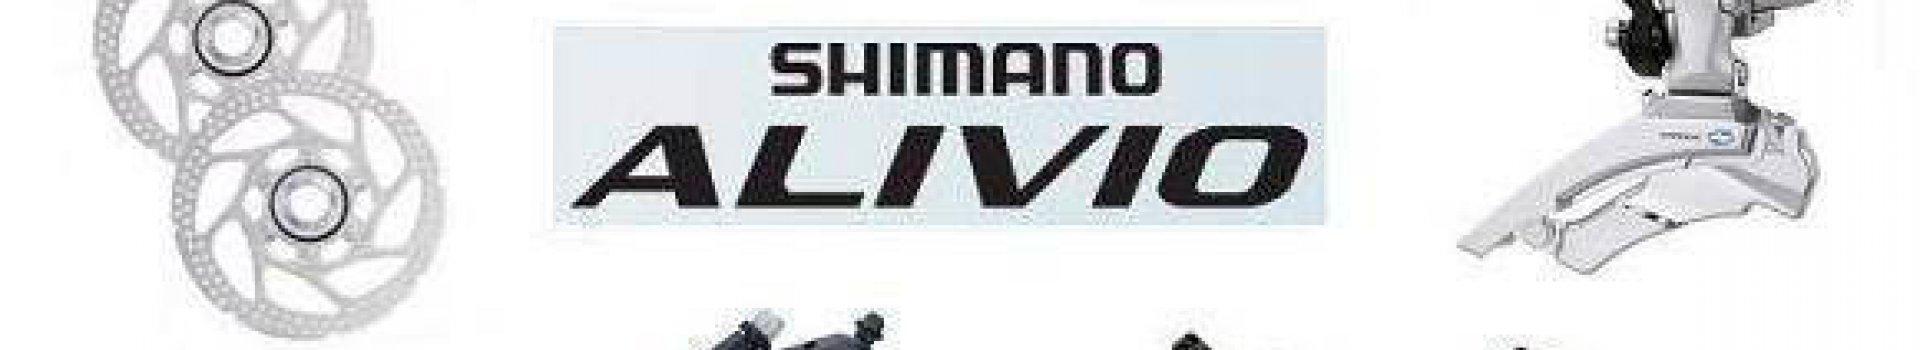 Nowości Shimano 2015 - grupy Alivio i Tourney